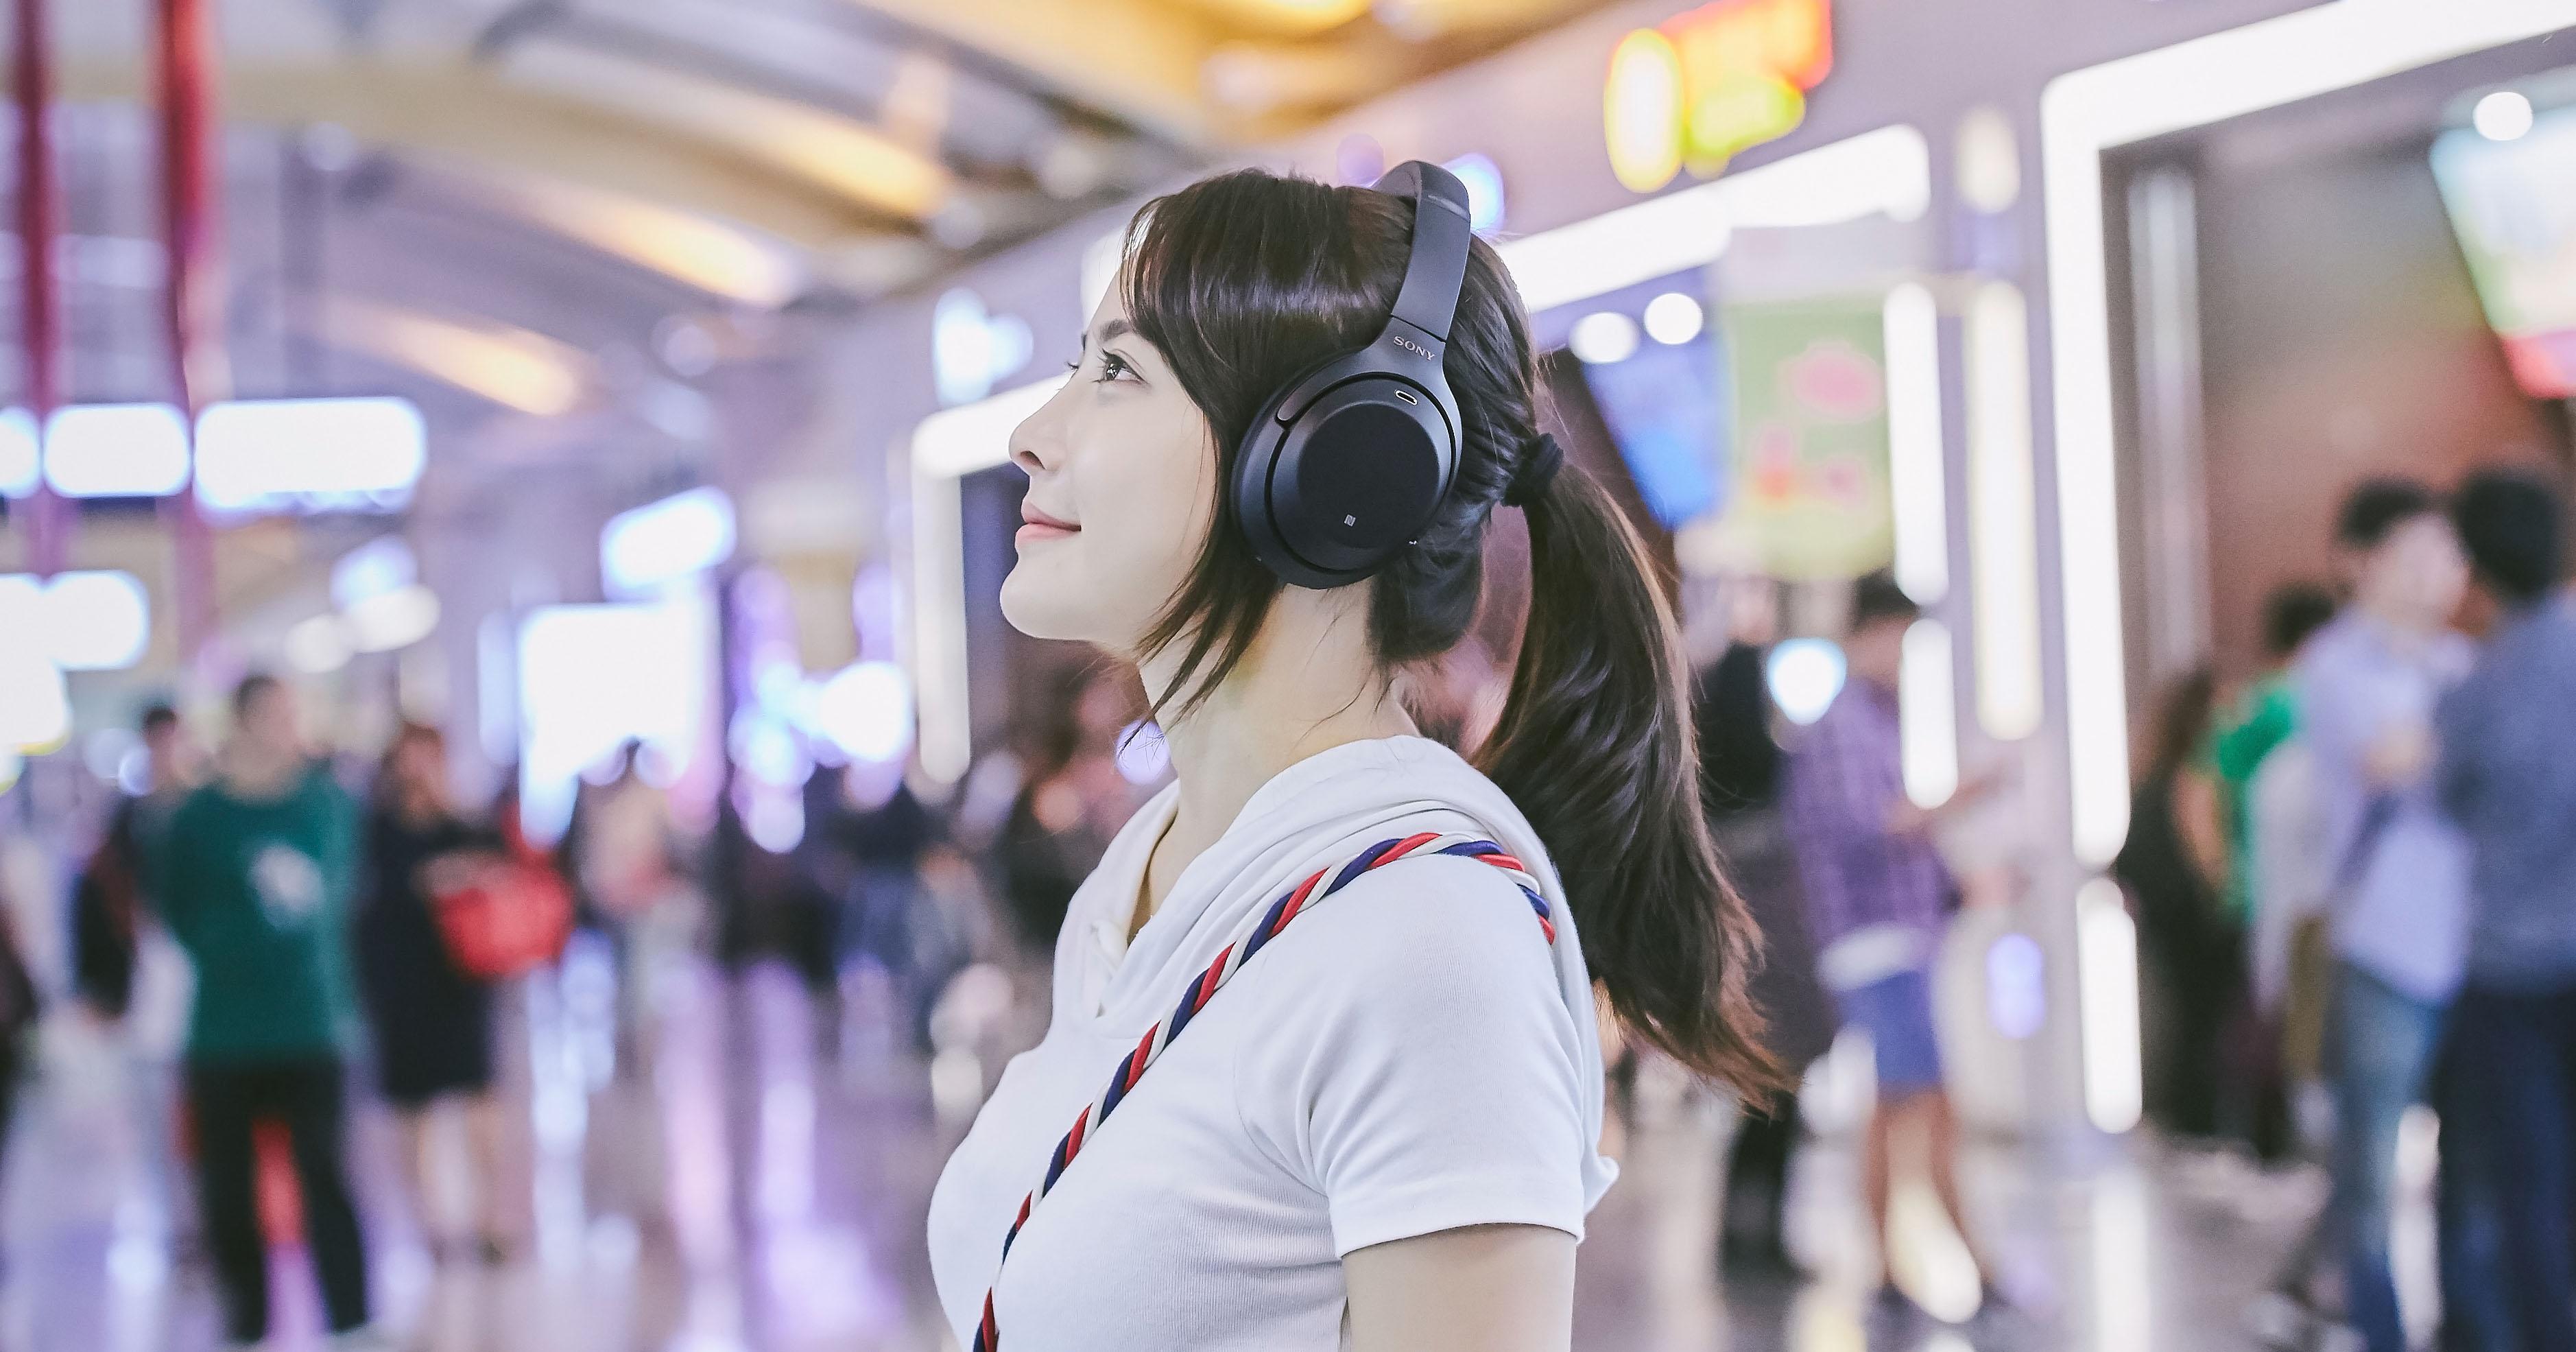 Sony WH-1000XM3 的降噪效果有多好?實際走訪五大生活場景,測了就知道!